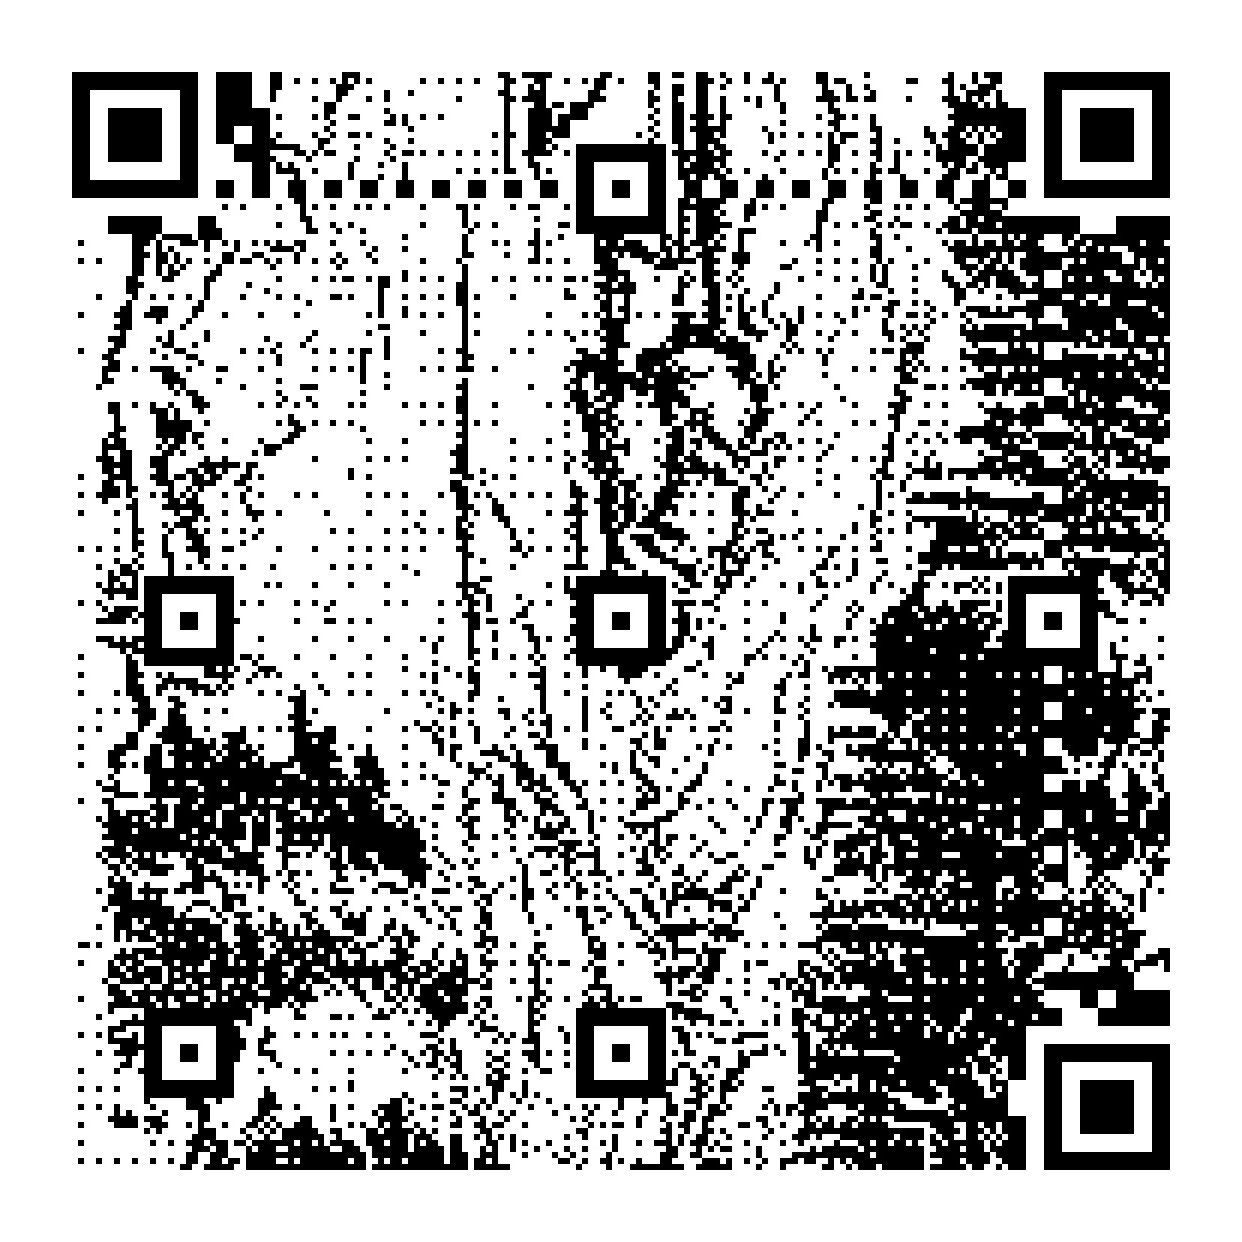 fuchun-c34.jpeg